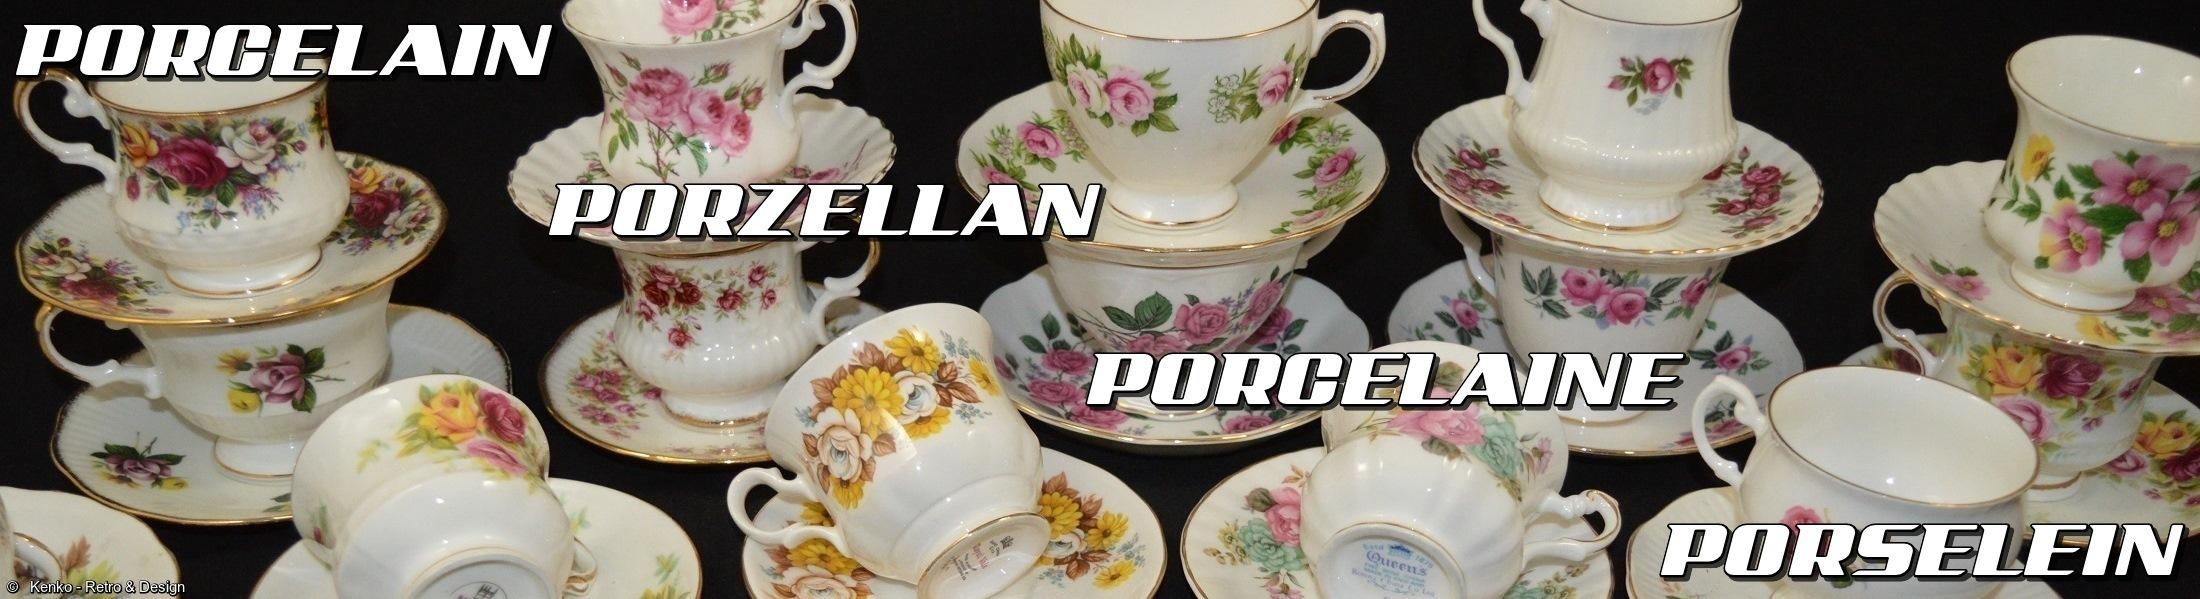 Porcelain Porzellan Porcelaine Porselein